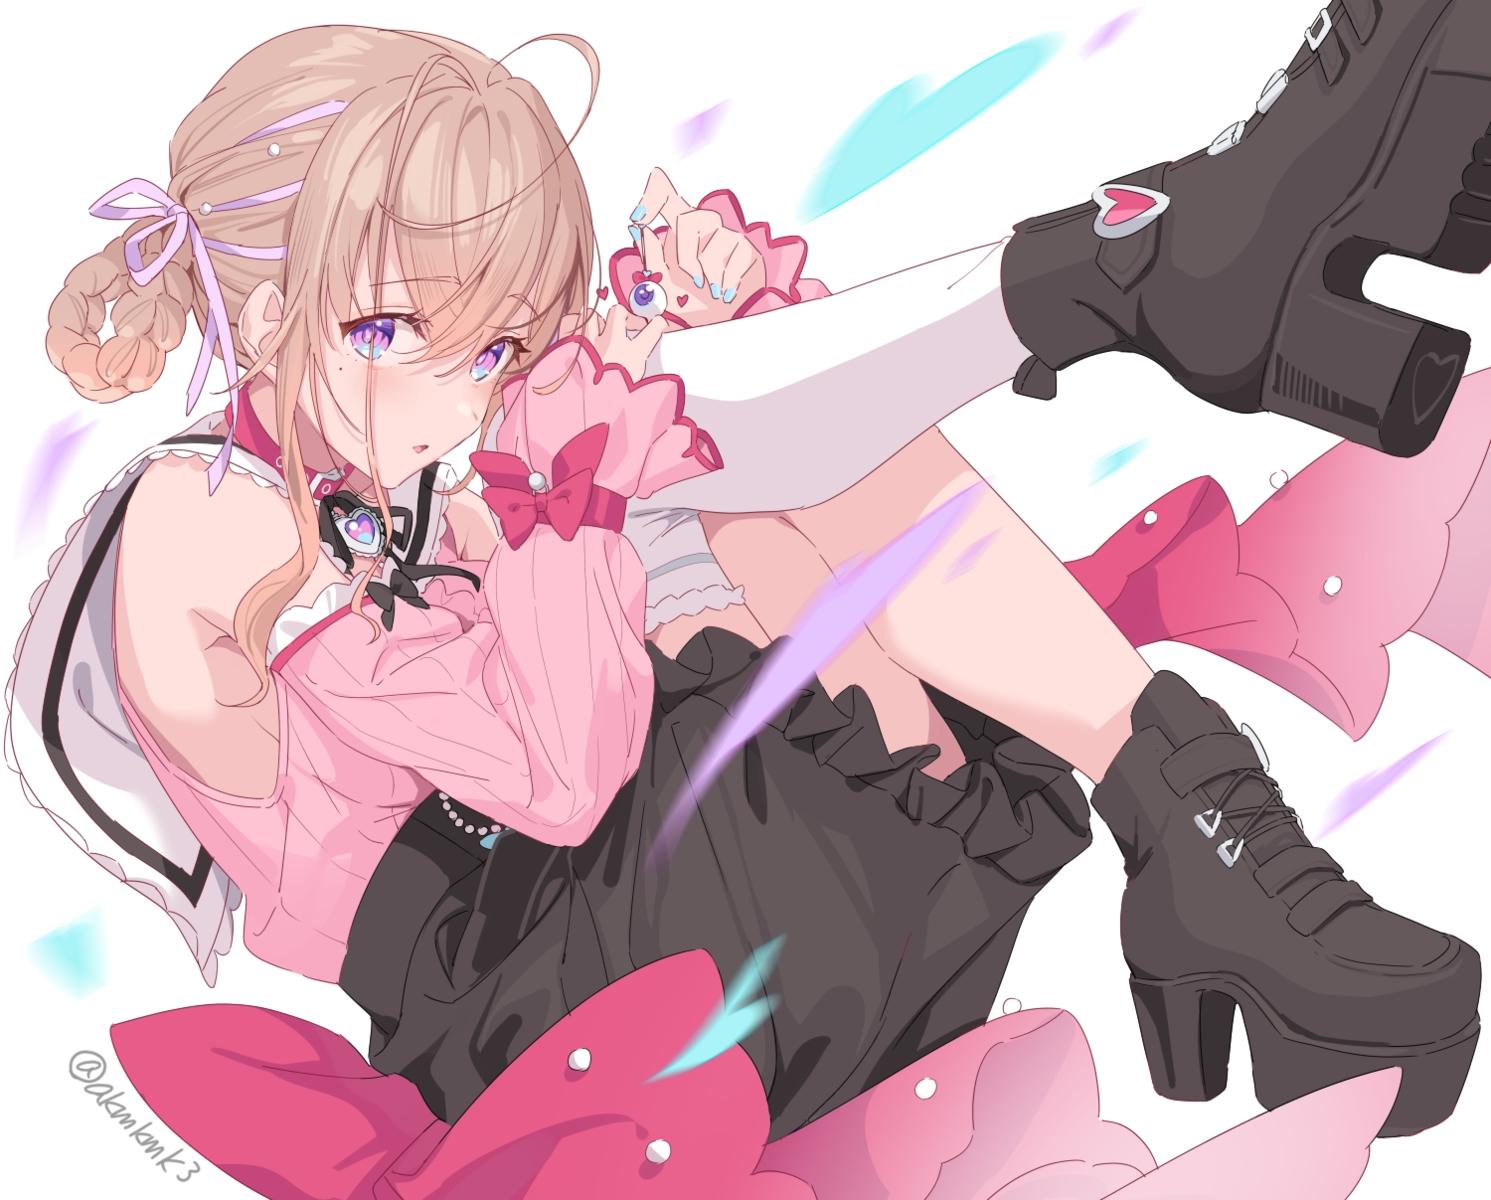 aizawa_momo akamoku blush boots bow brown_hair cape collar purple_eyes ribbons short_hair signed skirt thighhighs voice-ore